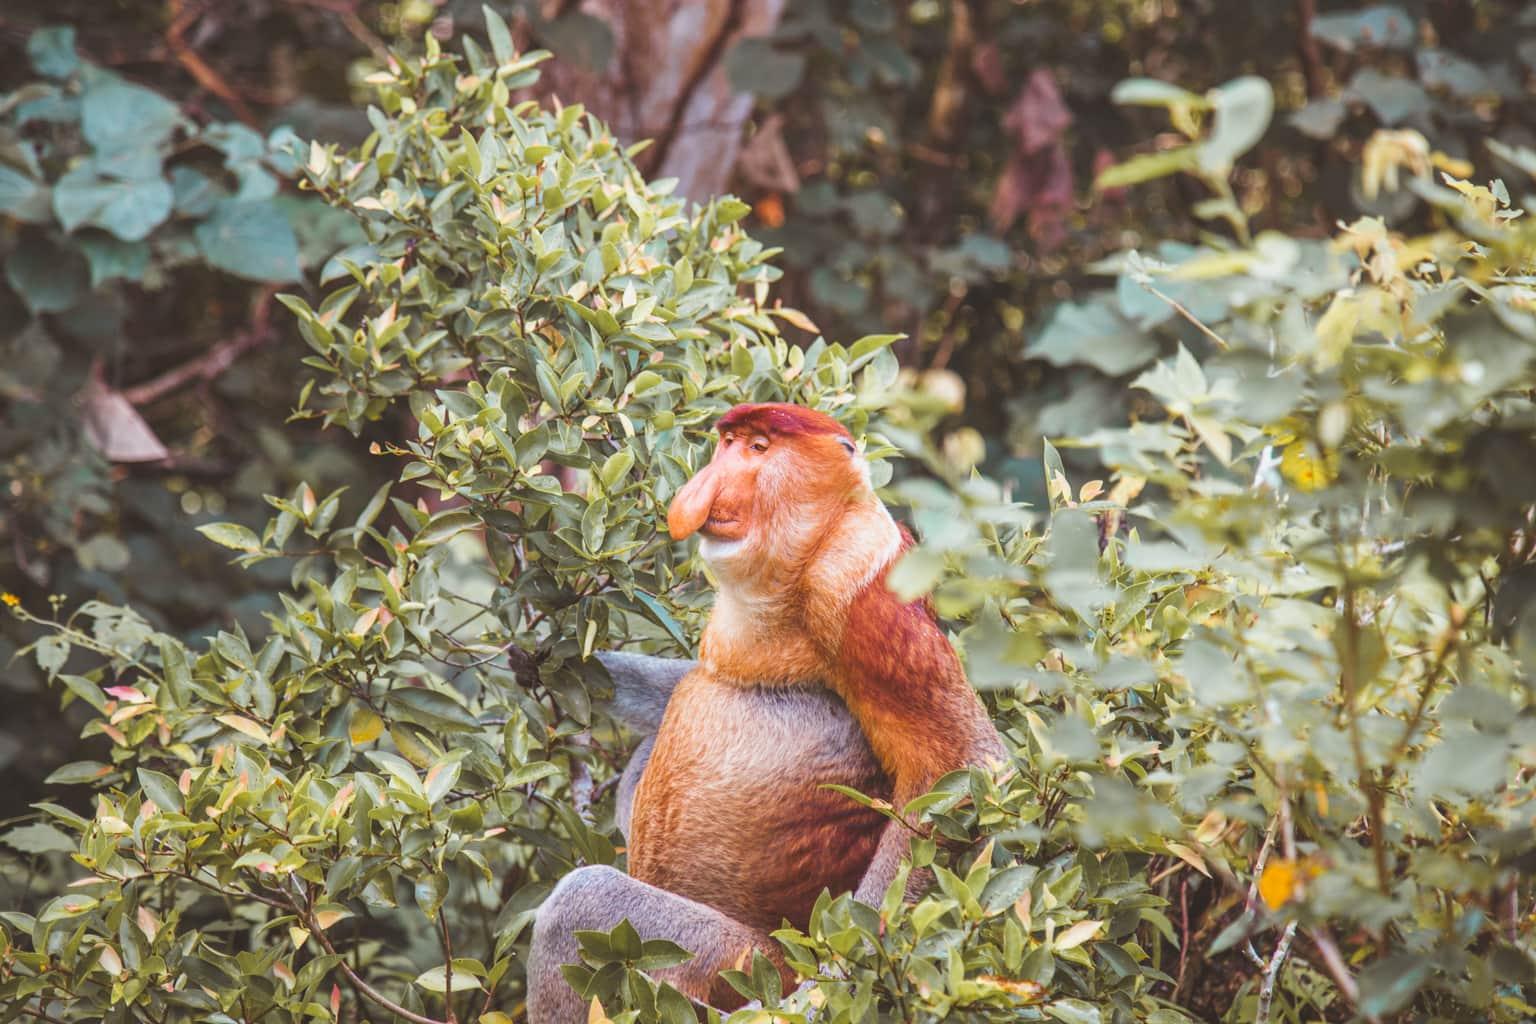 Proboscis monkey Borneo, Malaysia, Animal Welfare, Wildlife Sustainable Travel